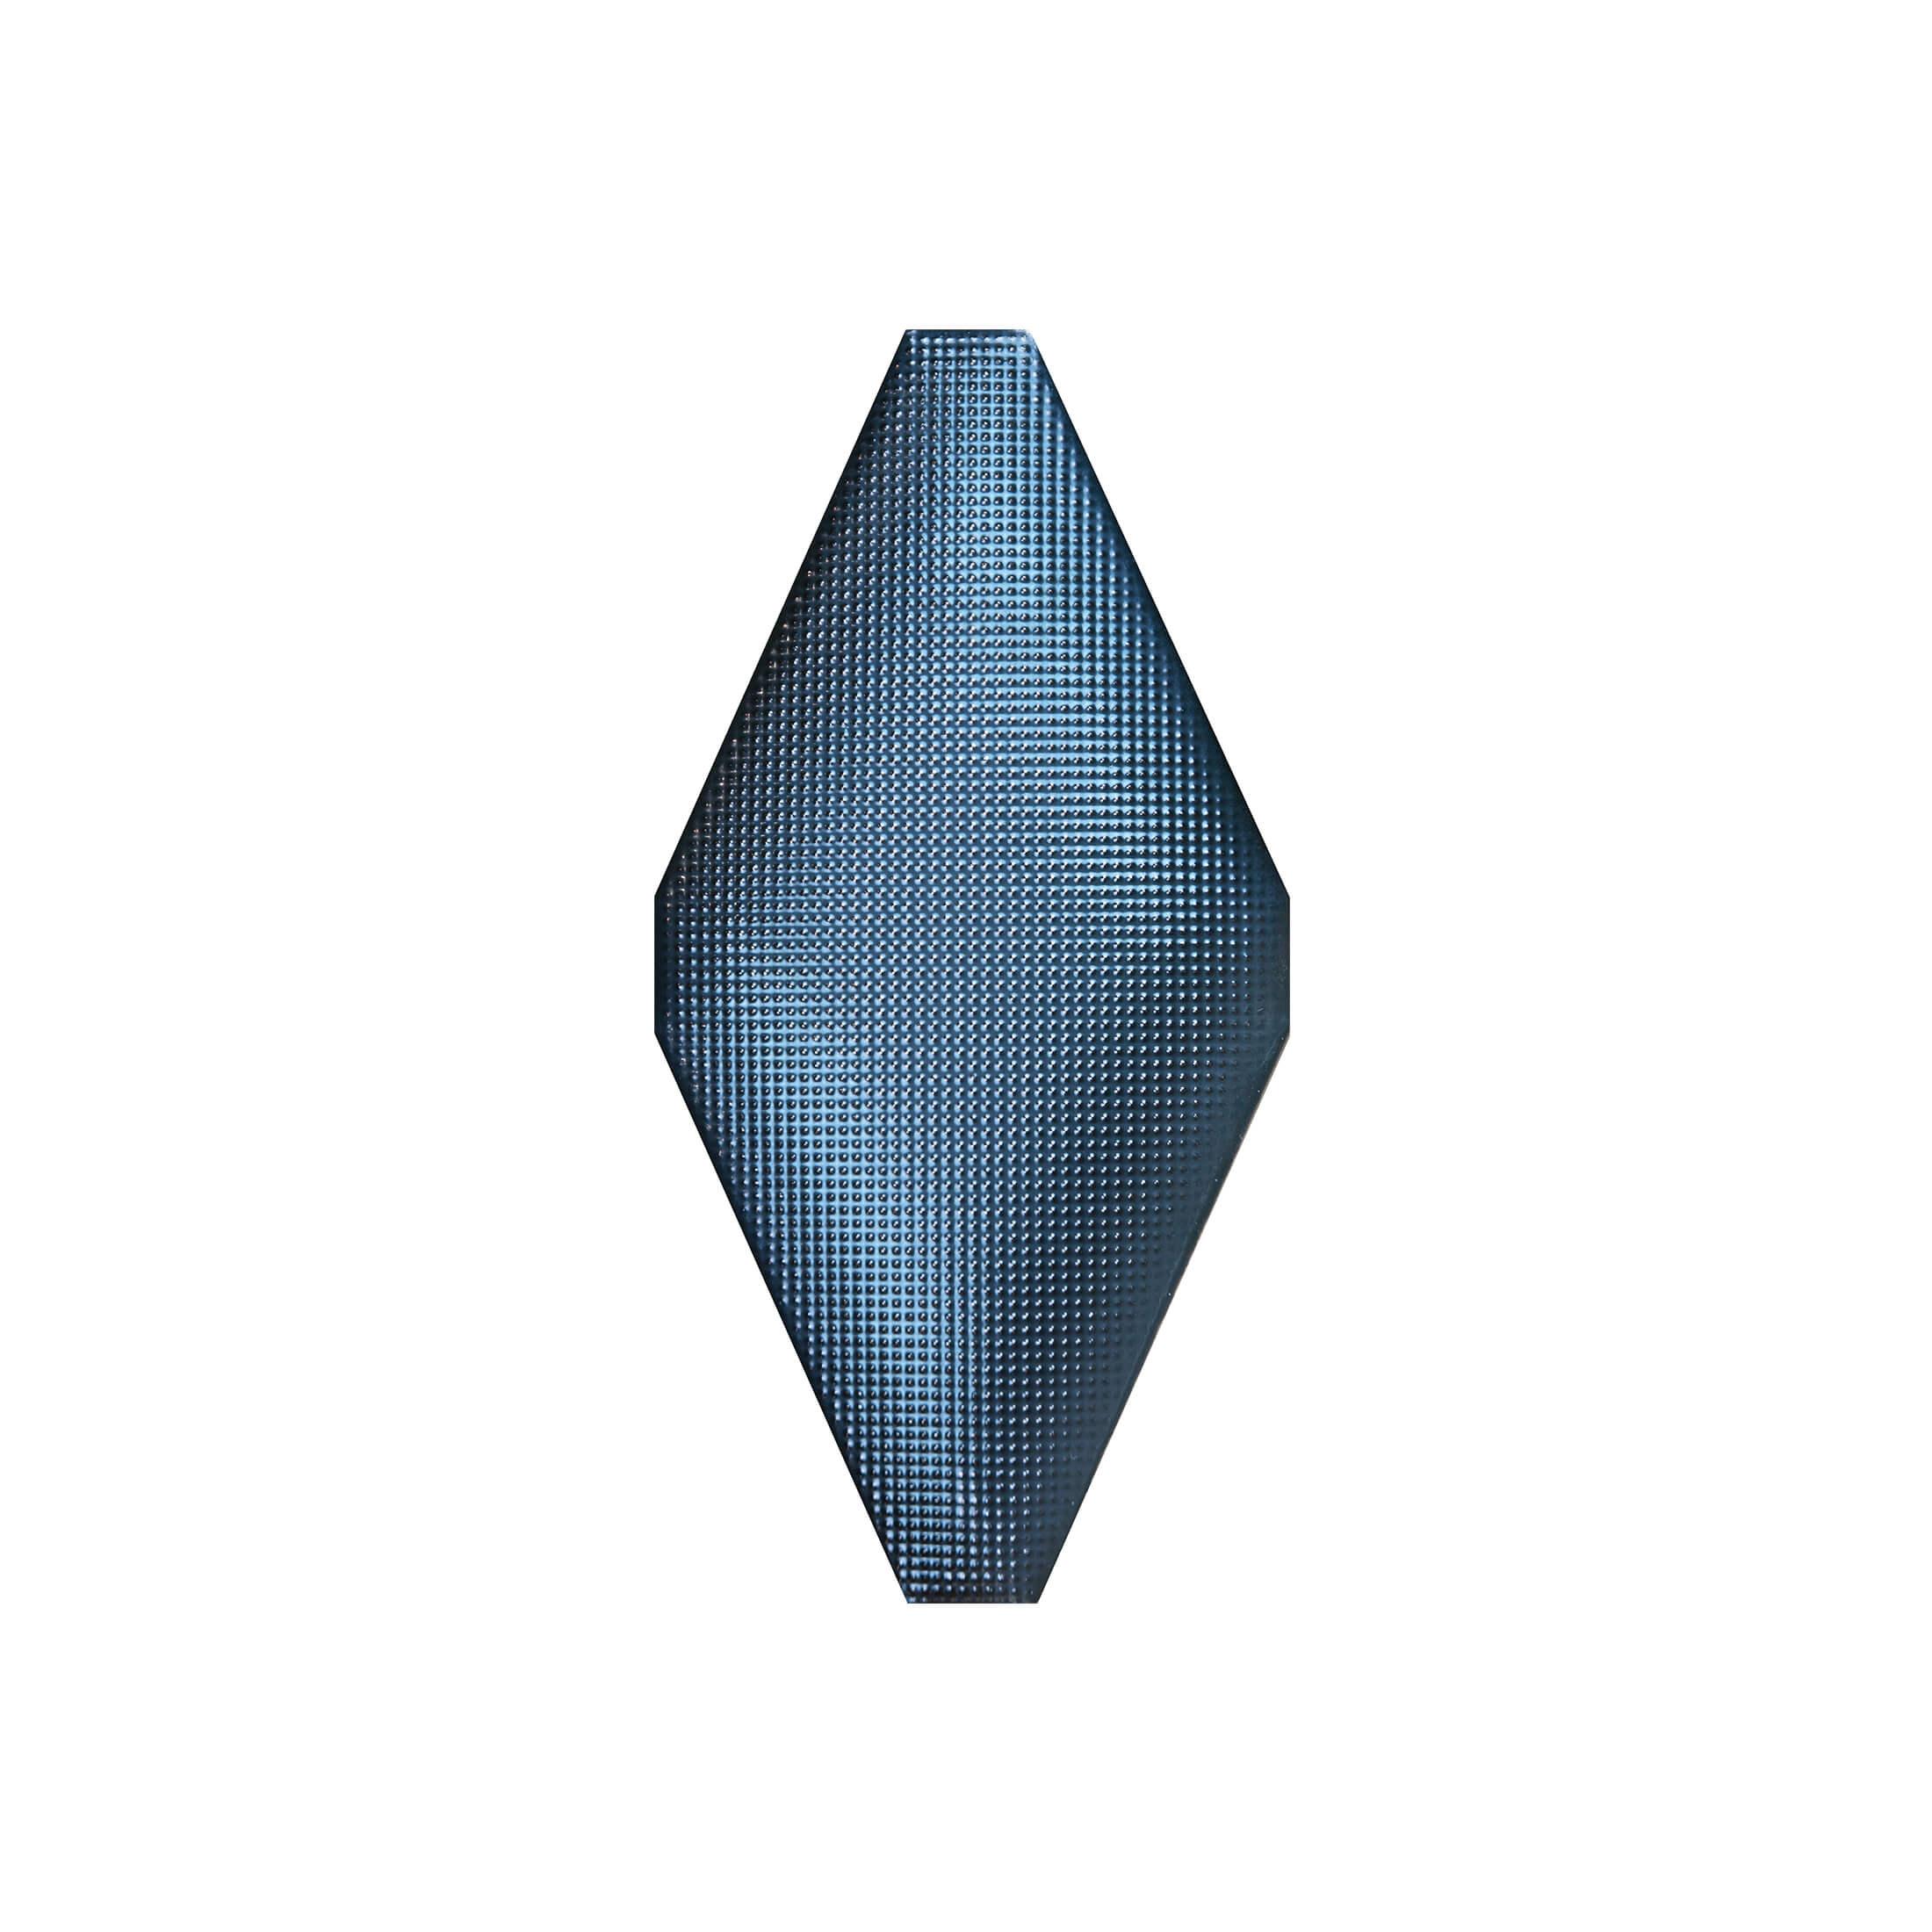 ADNE8122 - ROMBO ACOLCHADO COBALTO - 10 cm X 20 cm